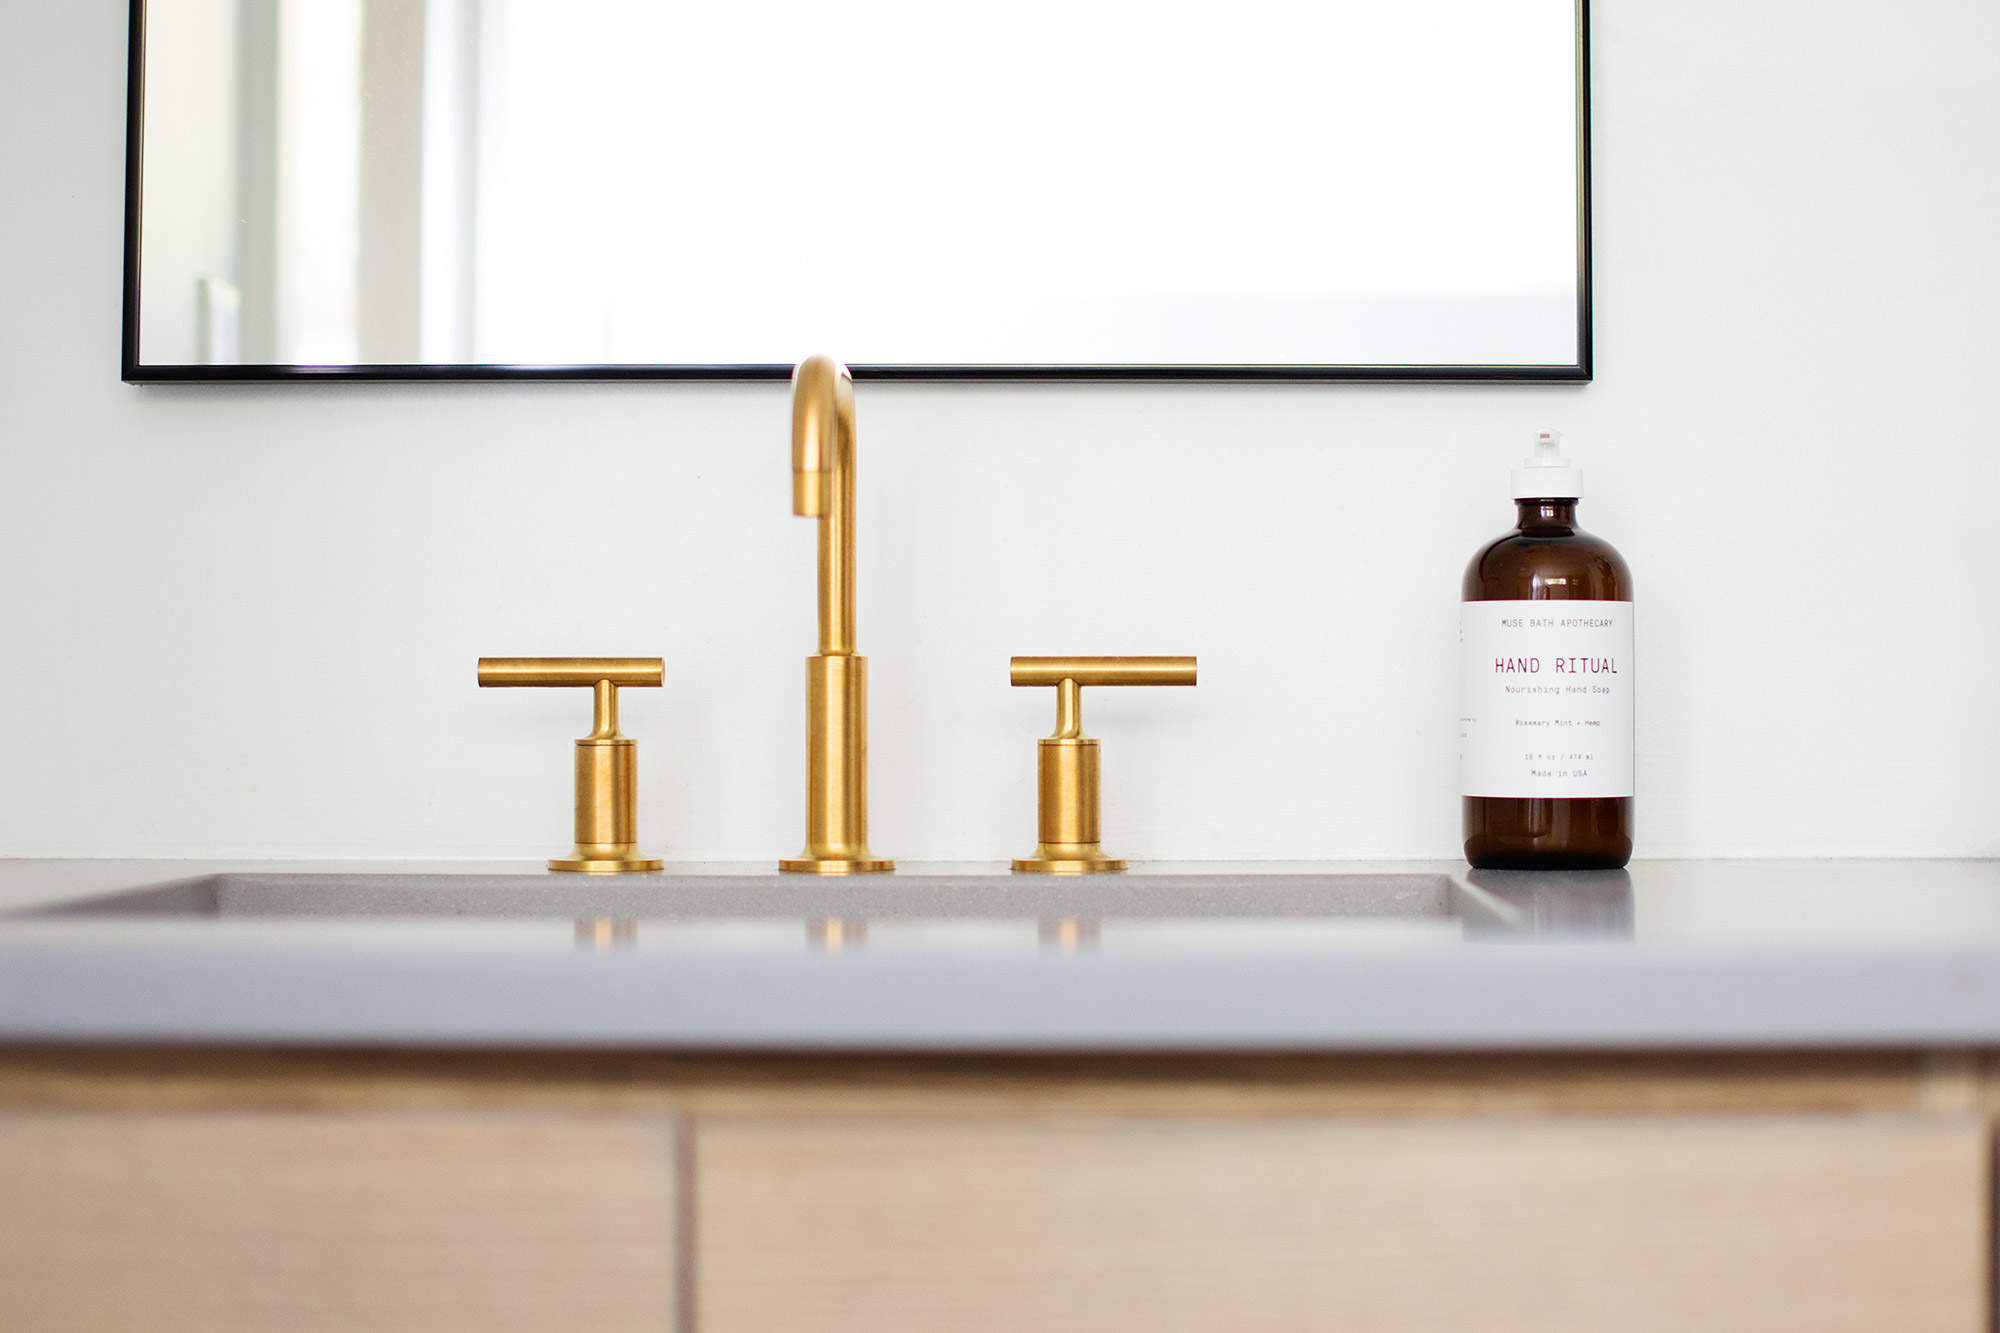 Sleek brushed brass faucet in midcentury modern master bathroom